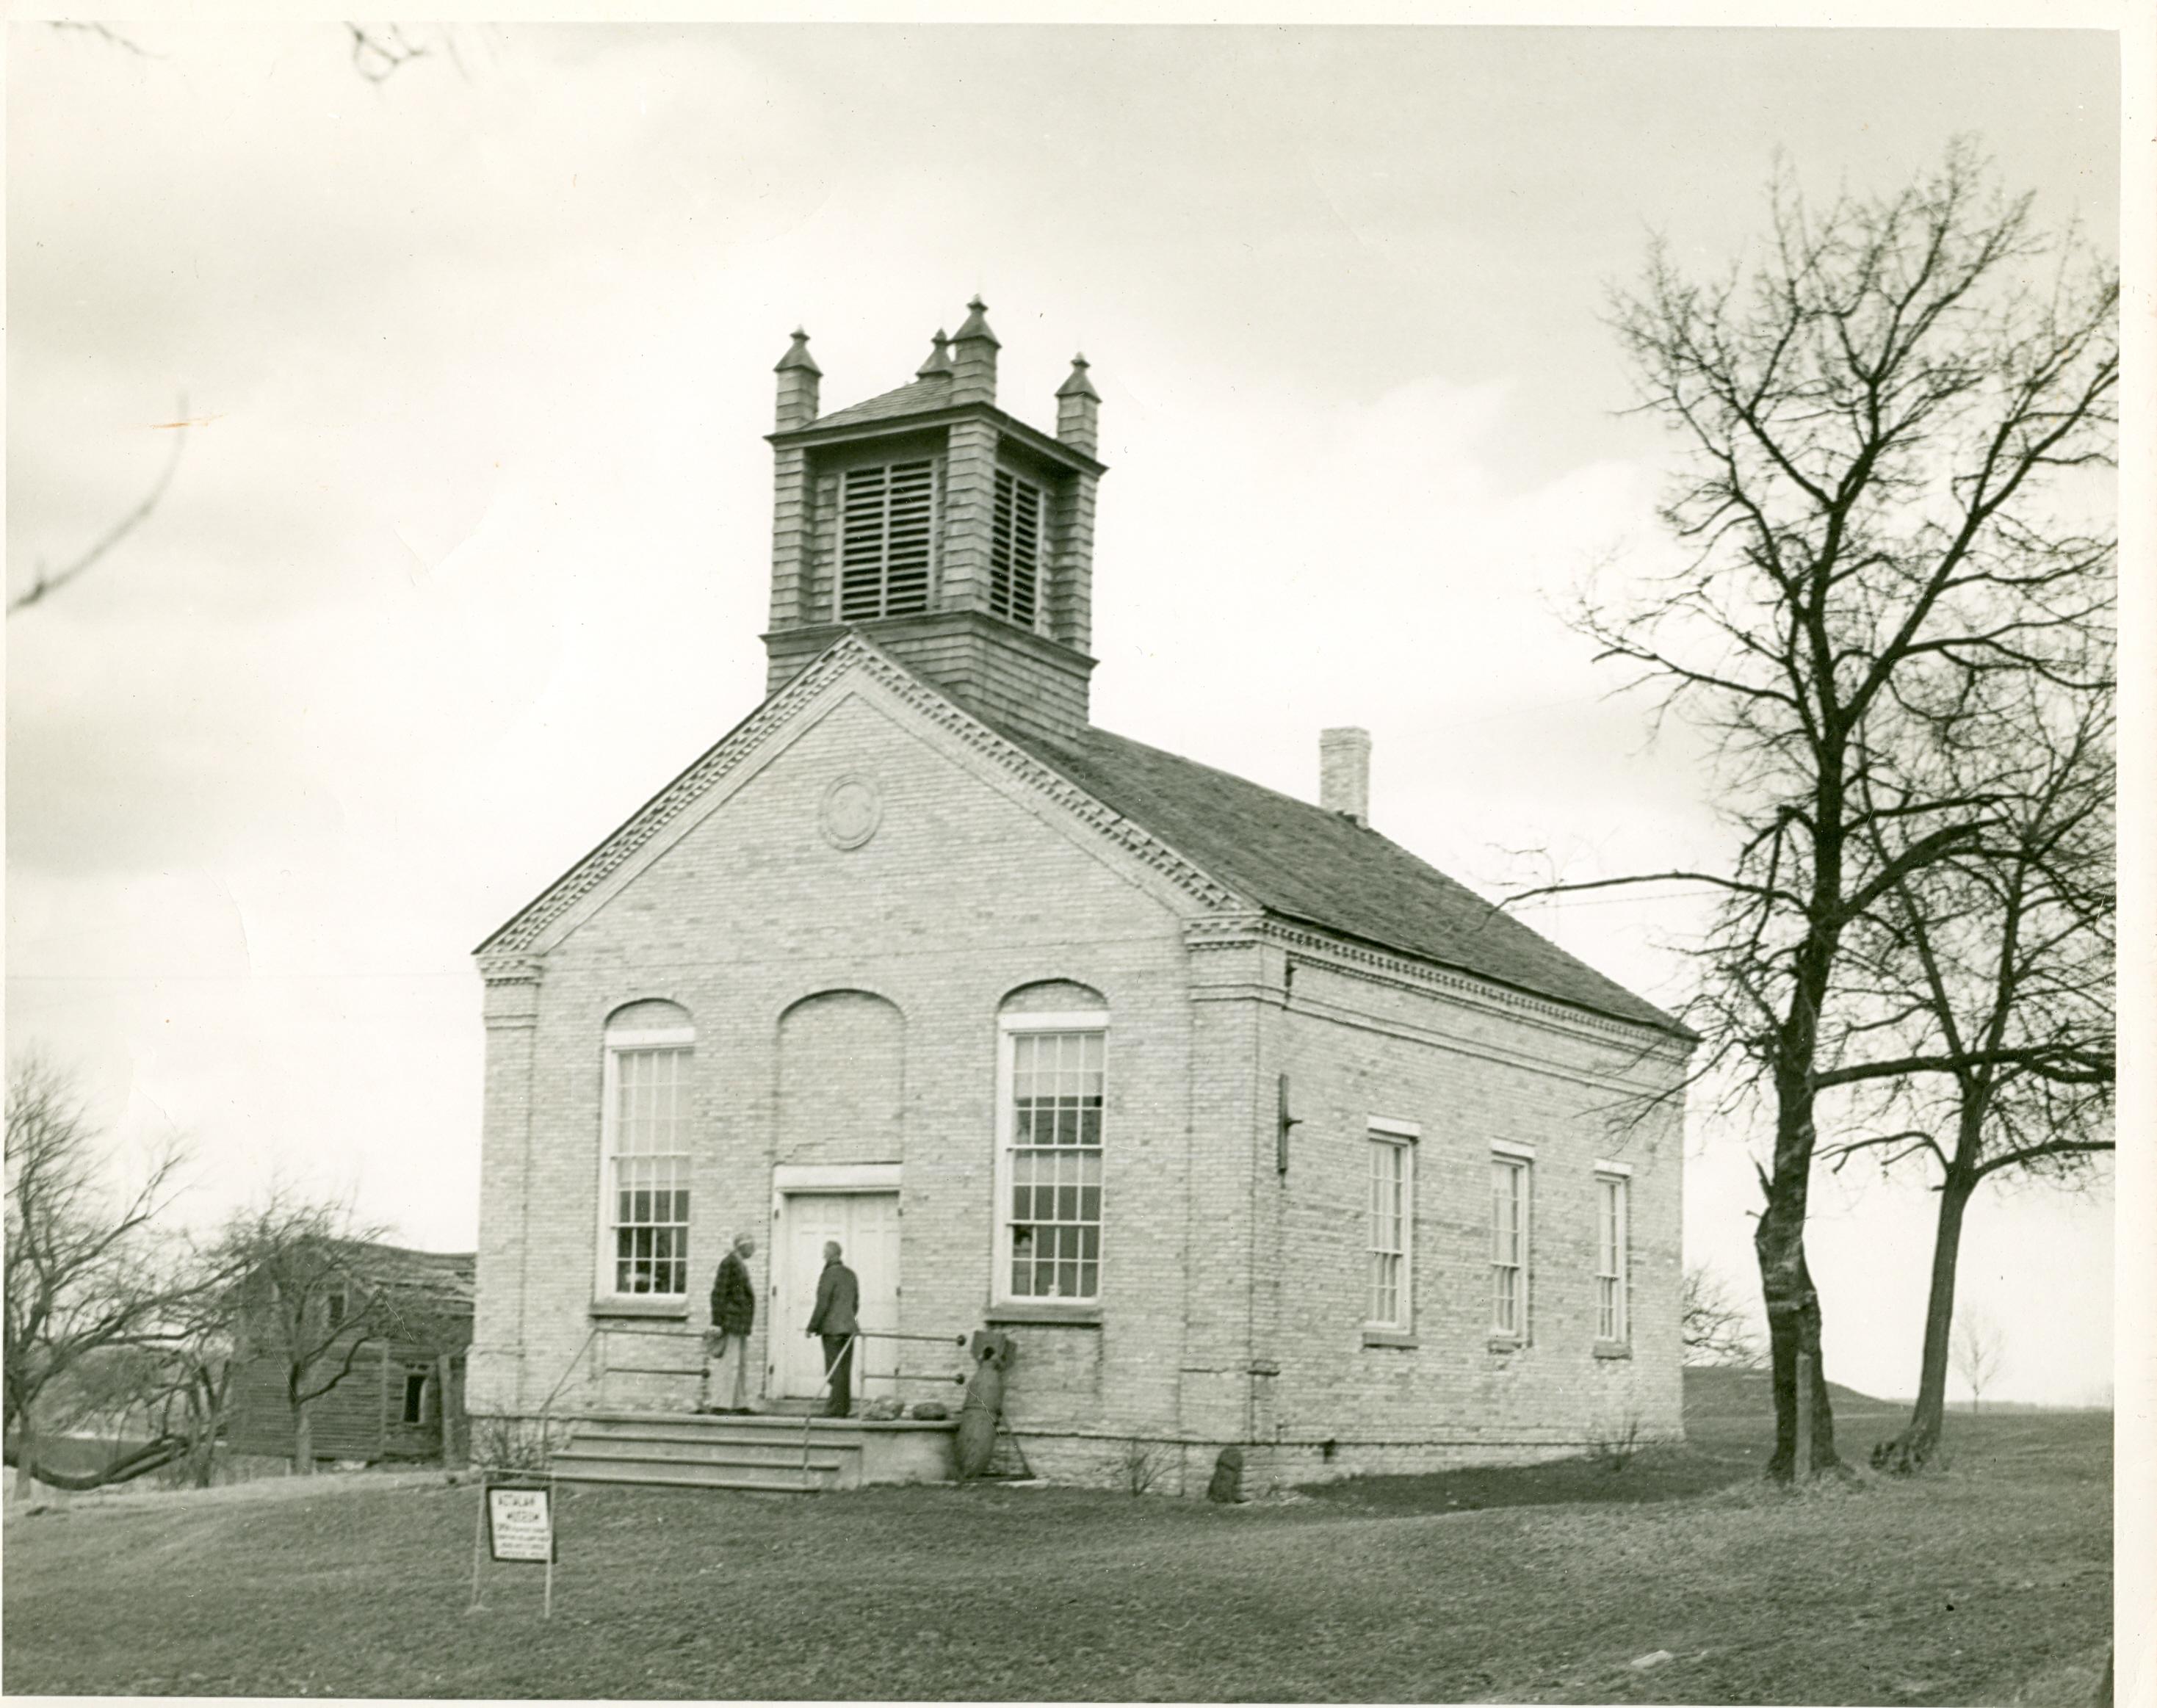 Aztalan Baptist Church built in 1852